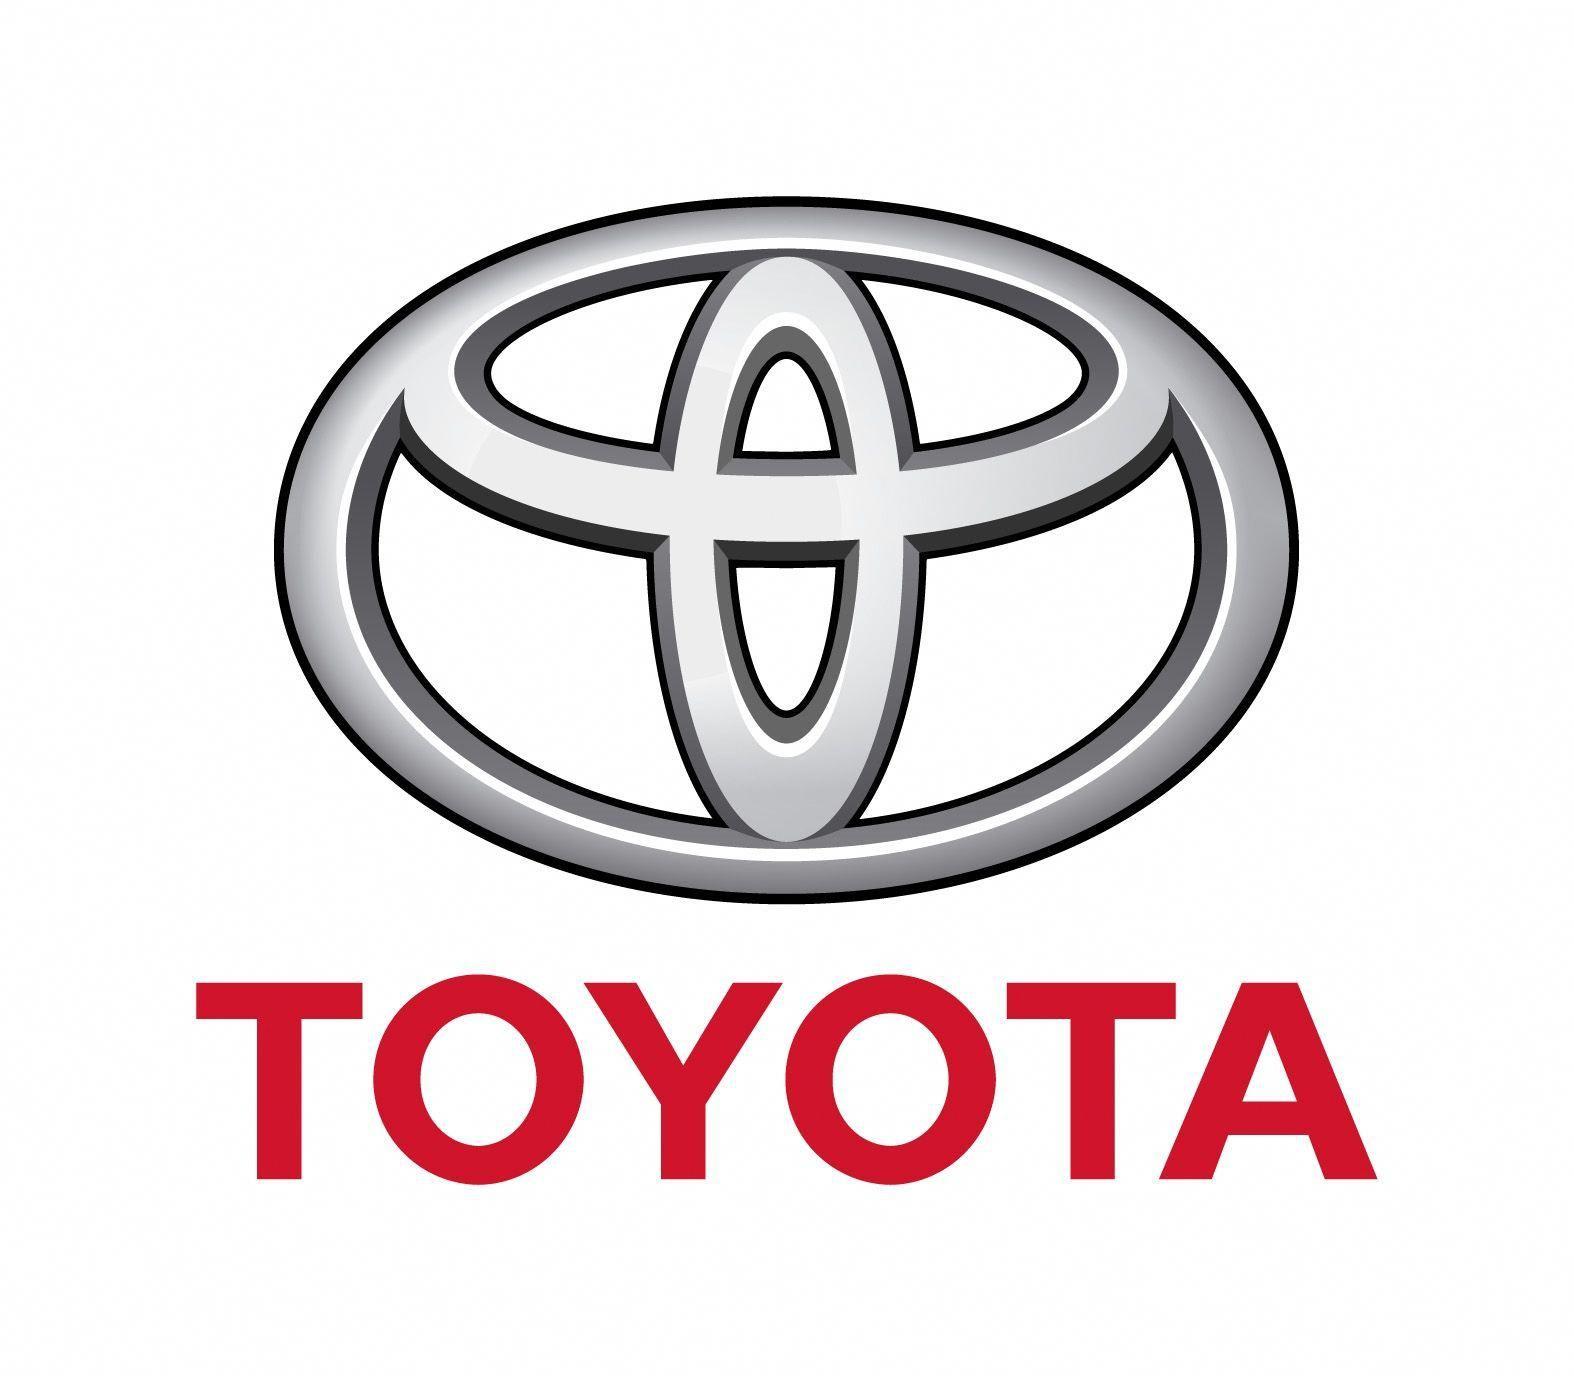 Toyota Logo What Does It Mean Toyota Logo Car Brands Logos Toyota